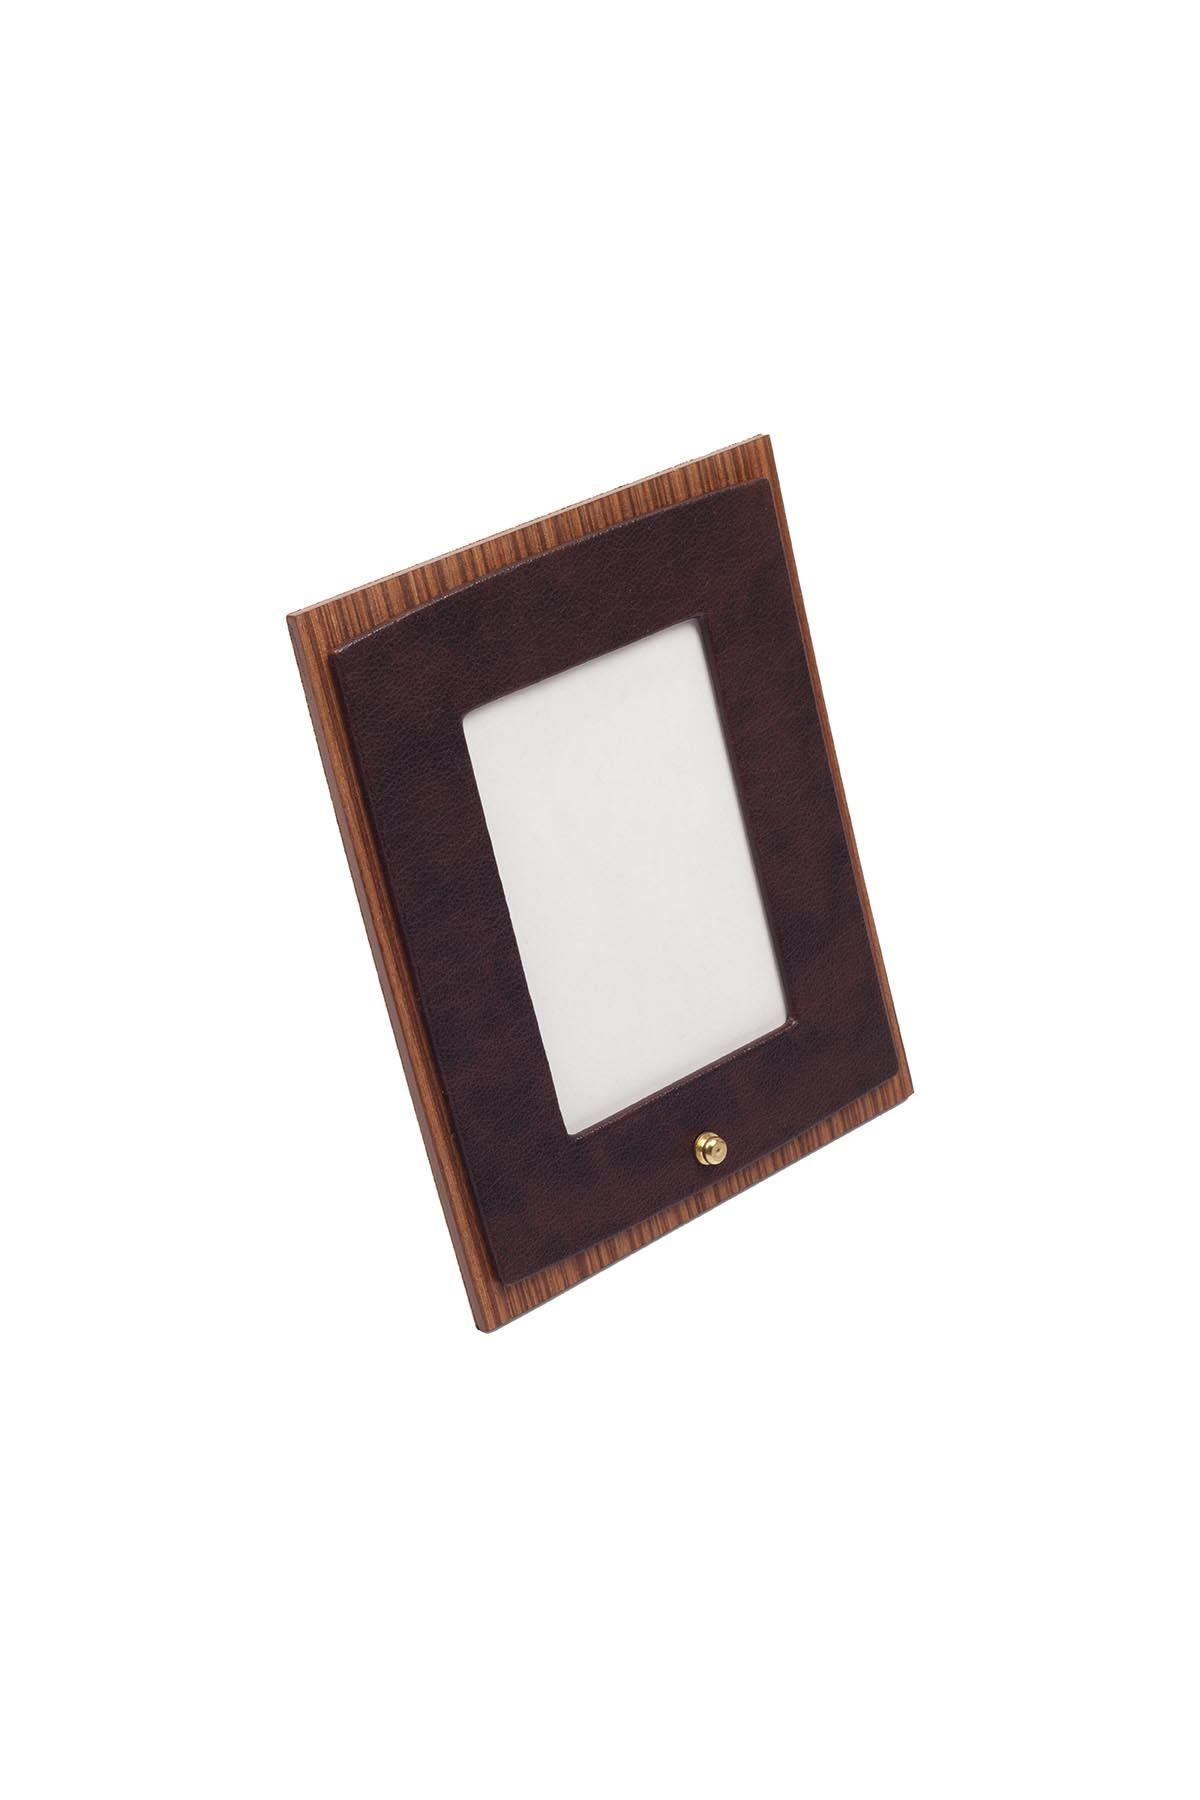 Star Lux Leather Desk Set Brown 10 Accessories